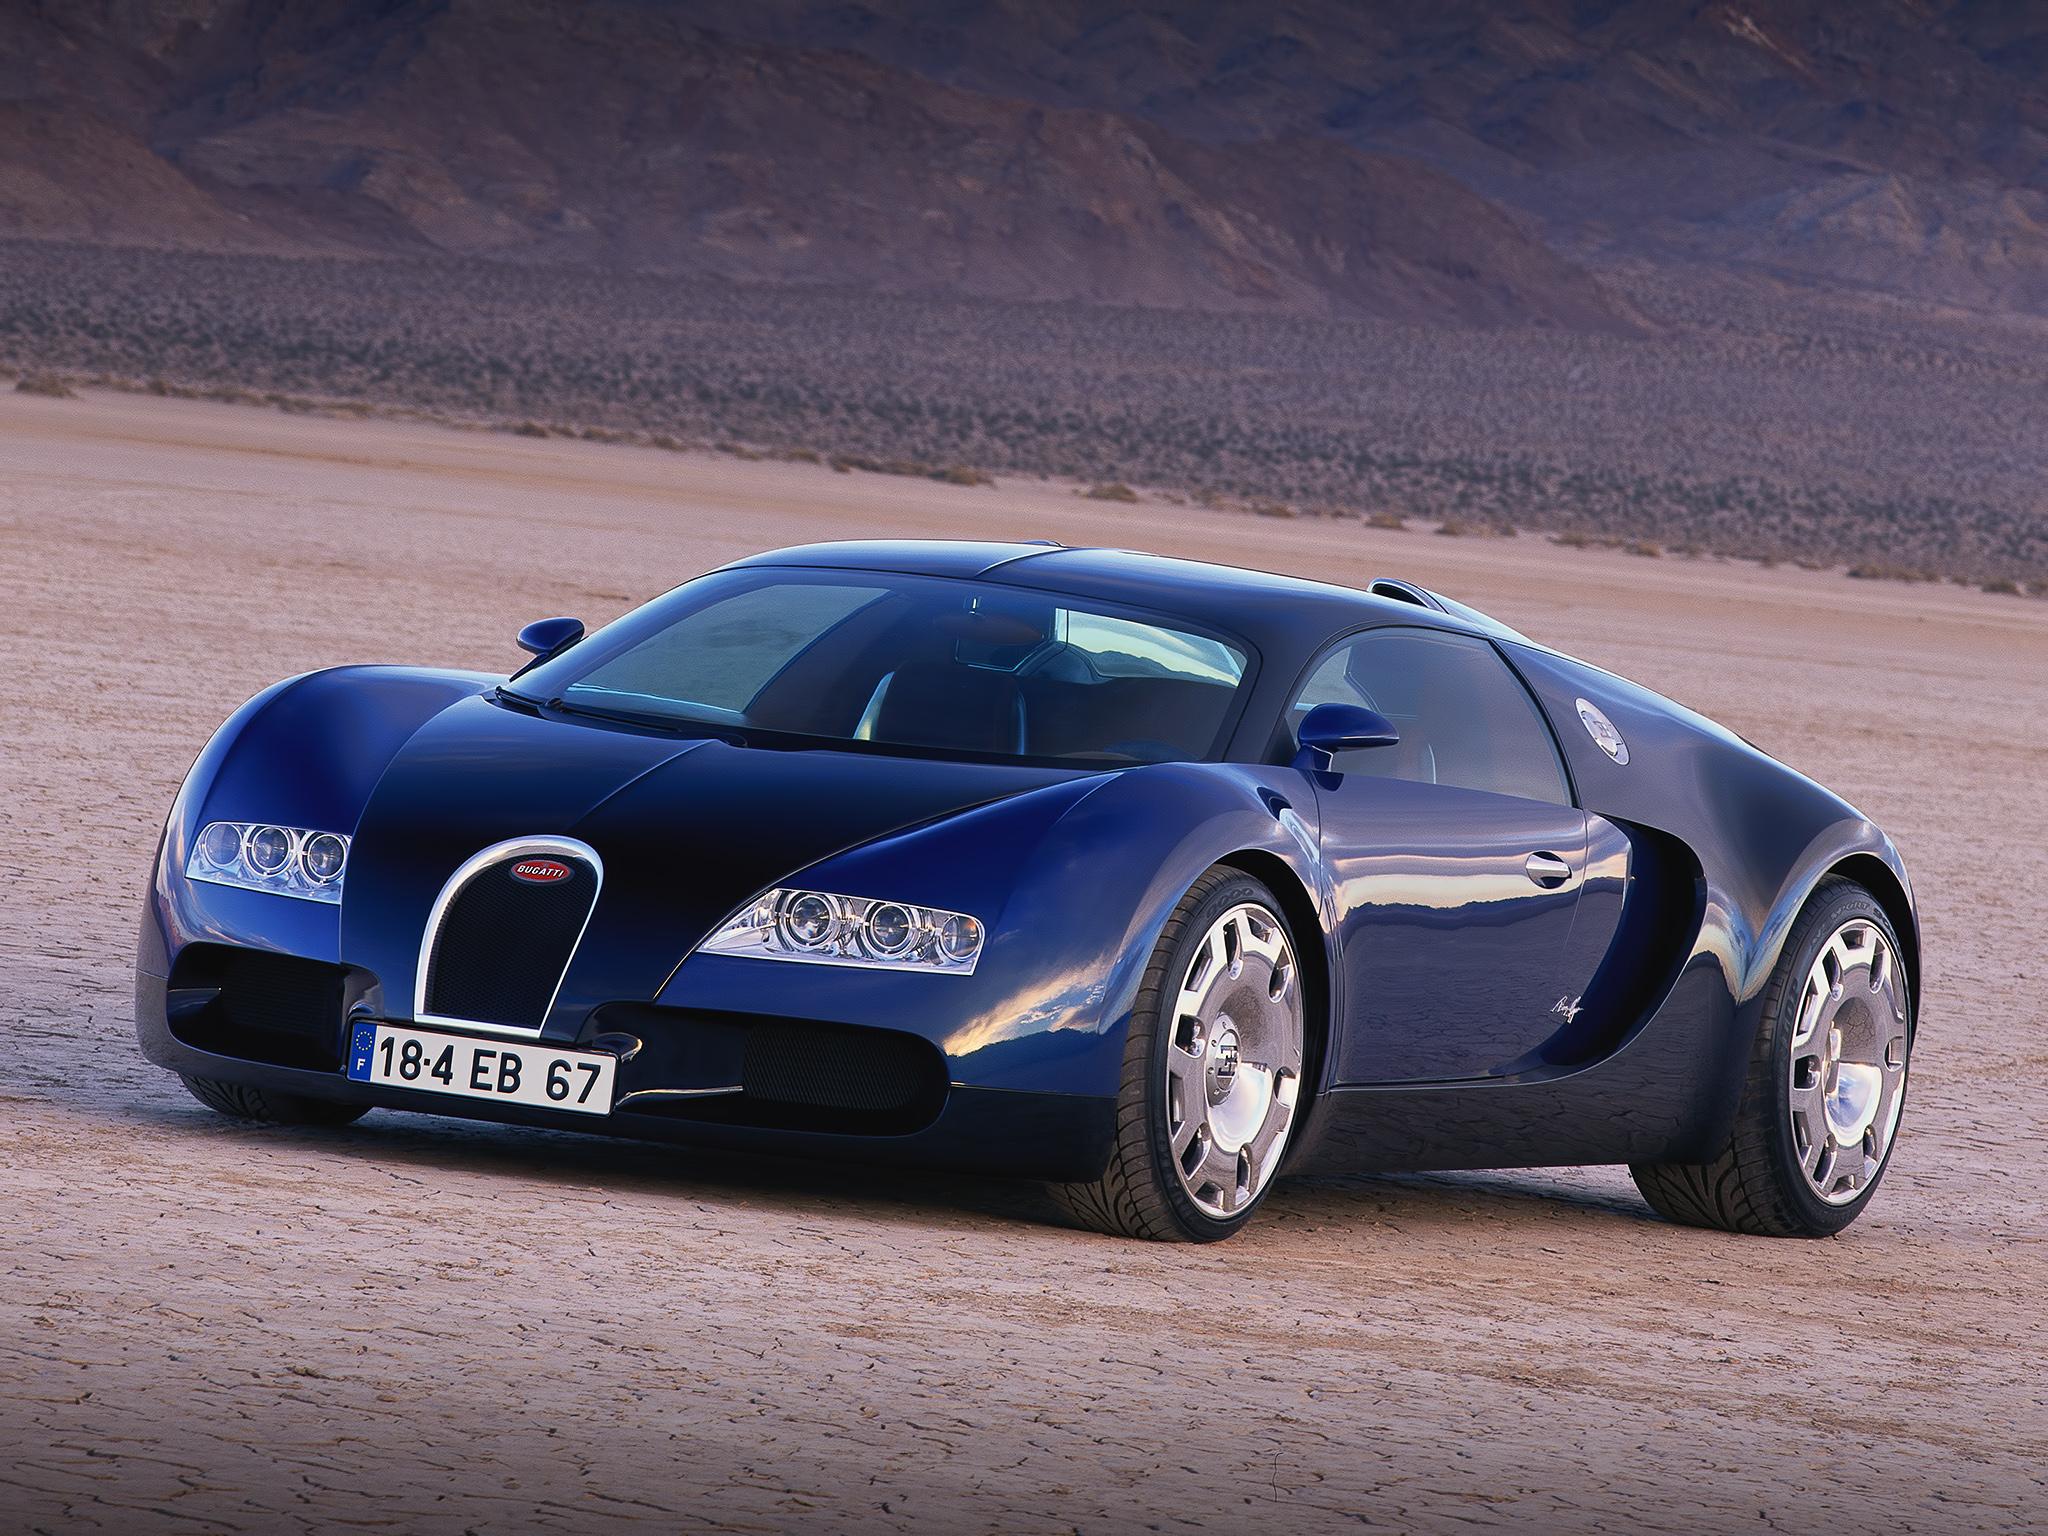 Kako je Bugatti ponovo oživljen